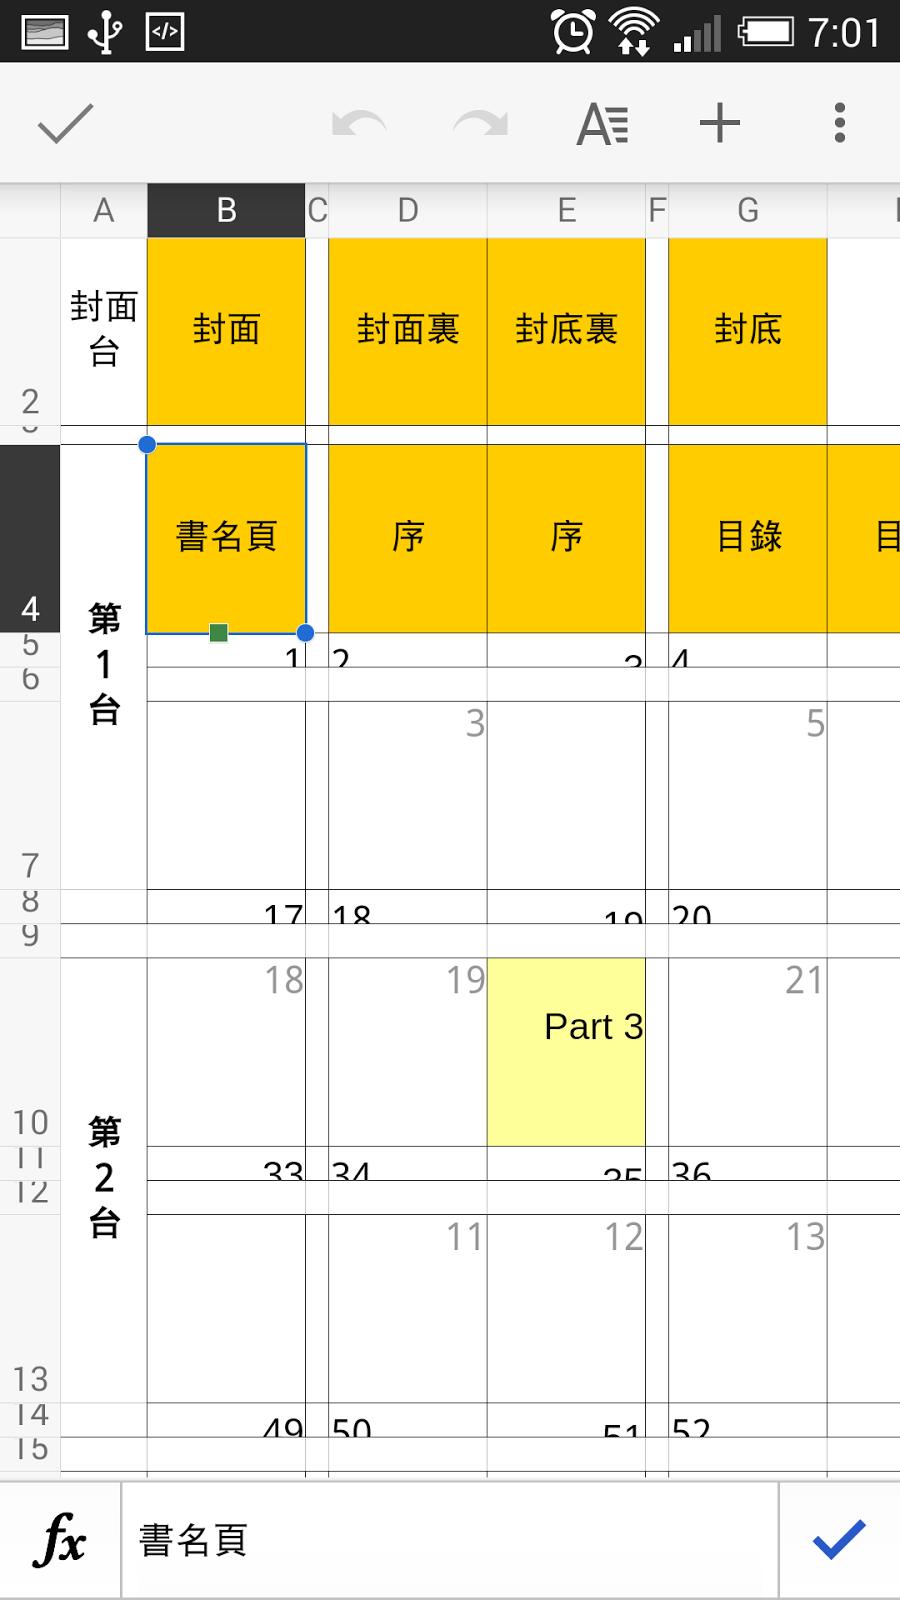 改變行動工作!電腦玩物 2014 最佳 Android App 推薦 Google+Drive+new-03